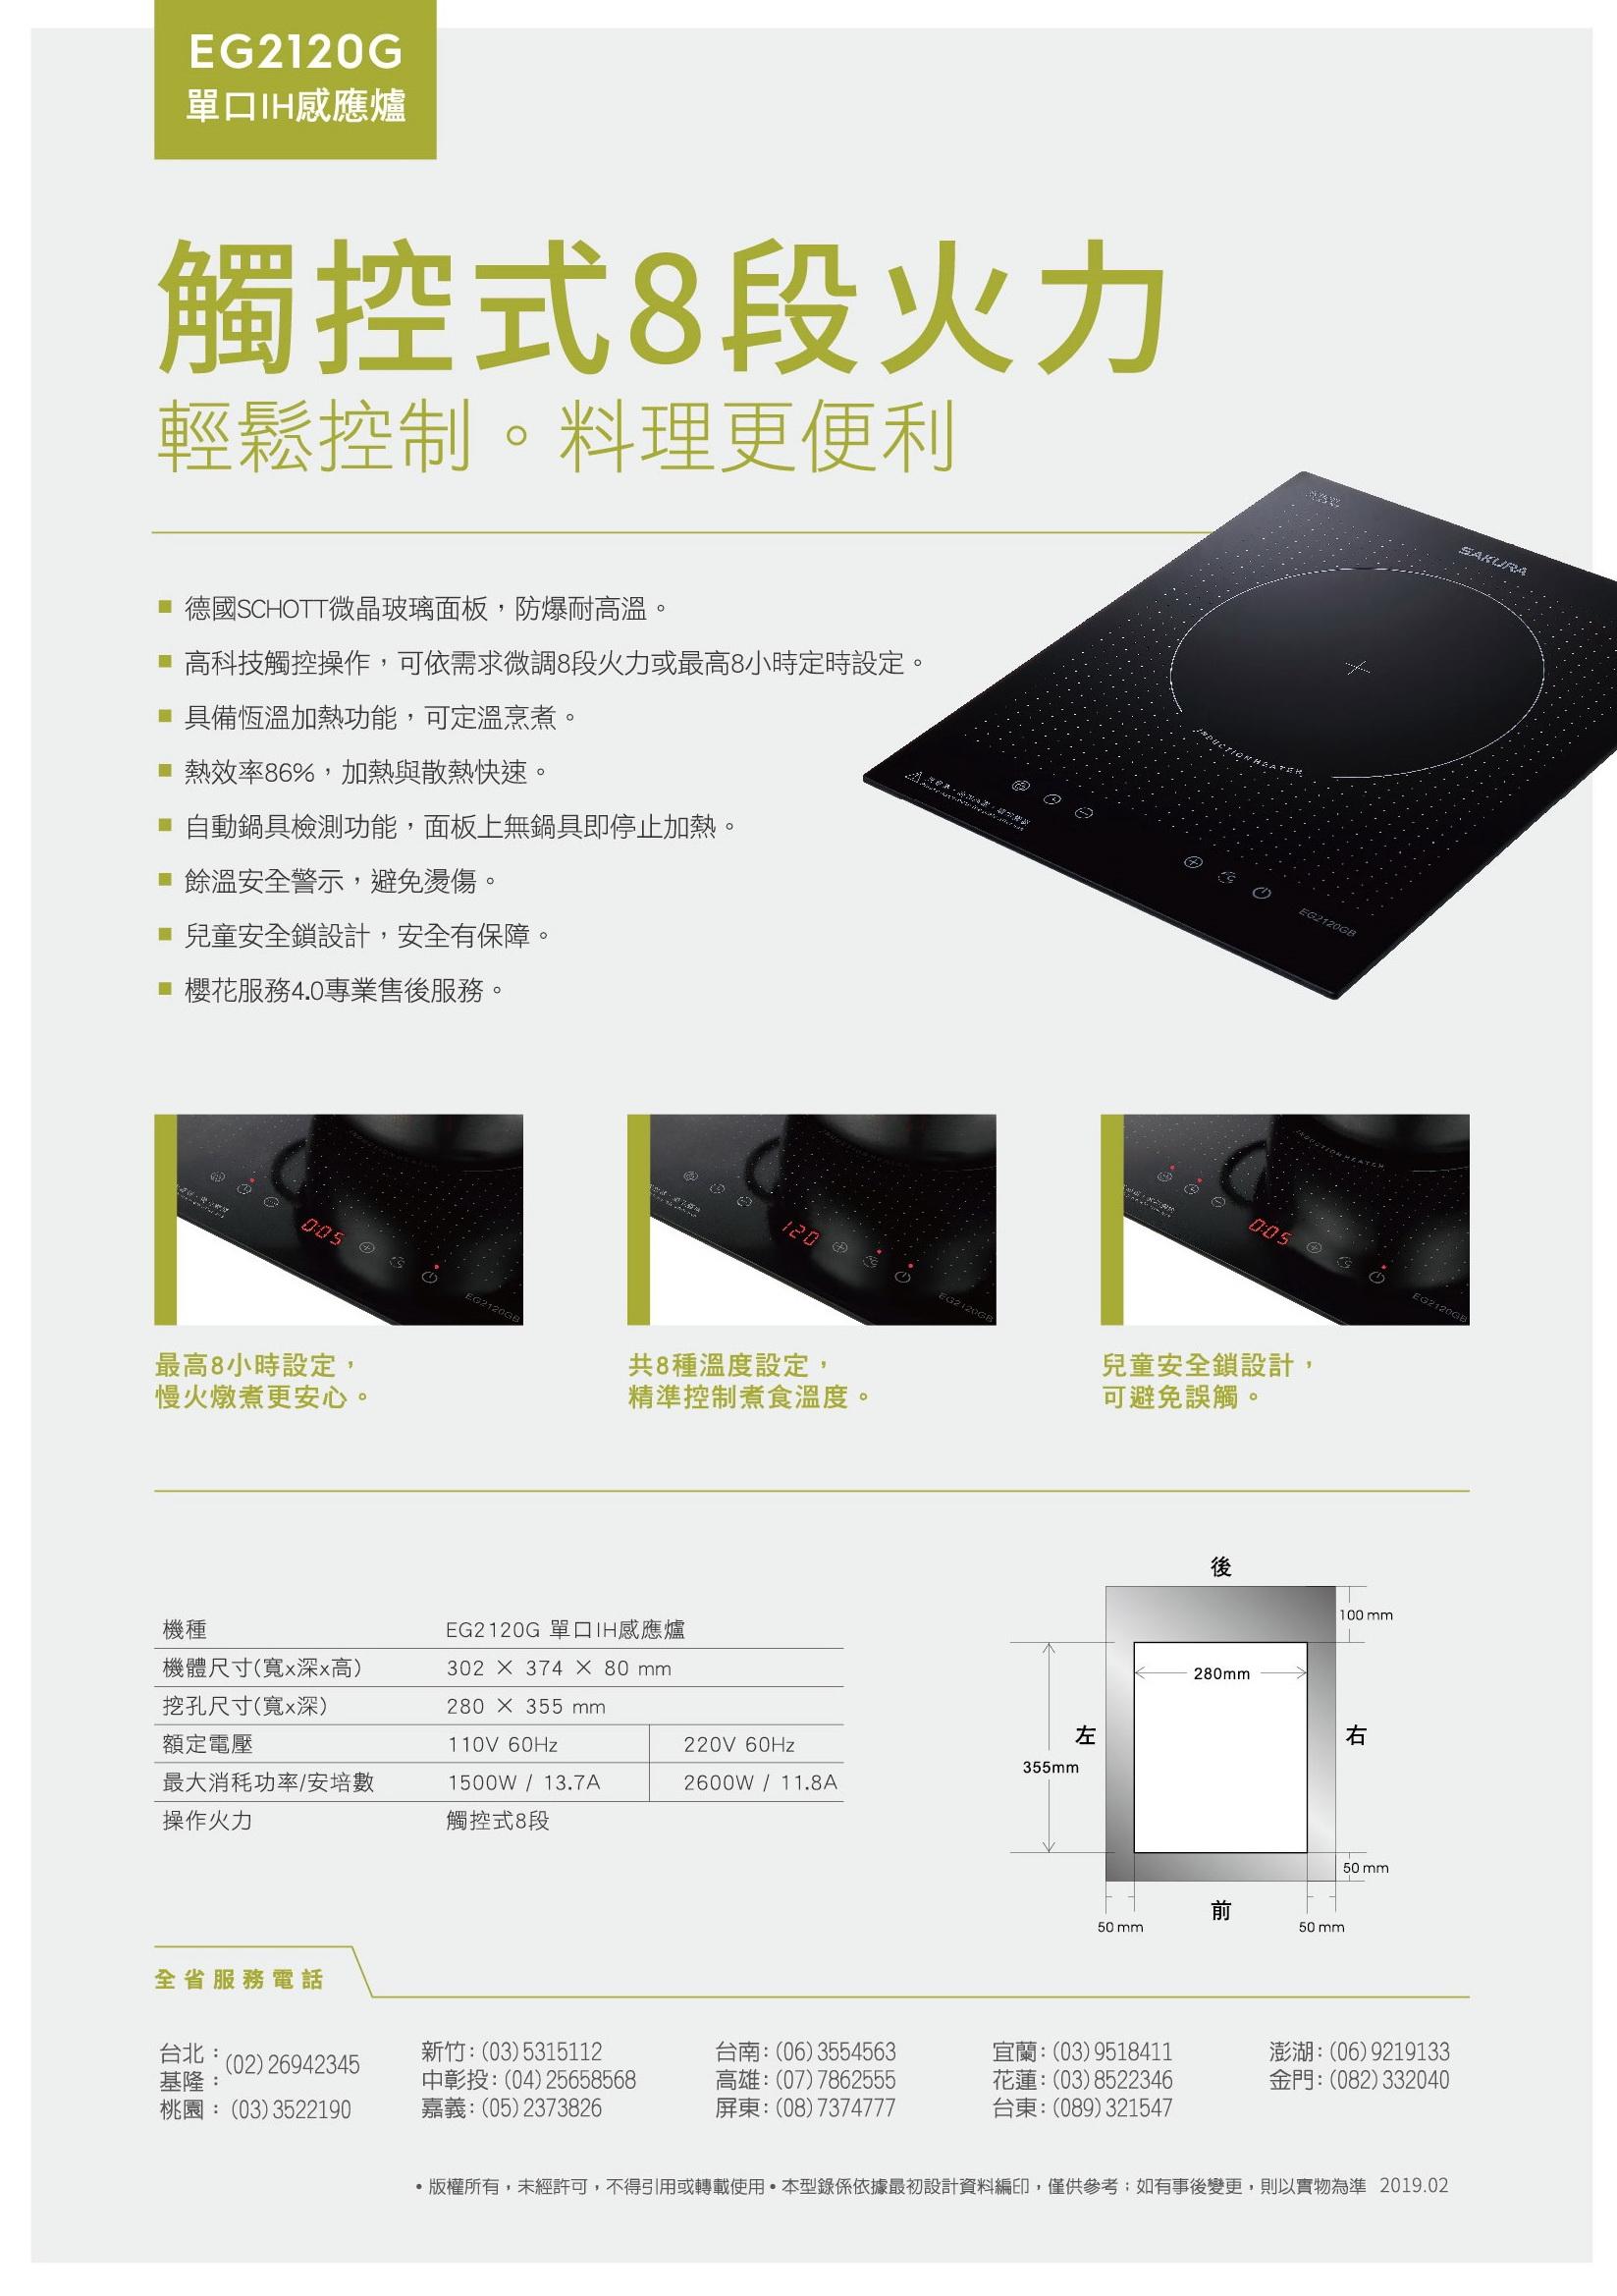 EG2120G_IH單口感應爐DM-2.jpg